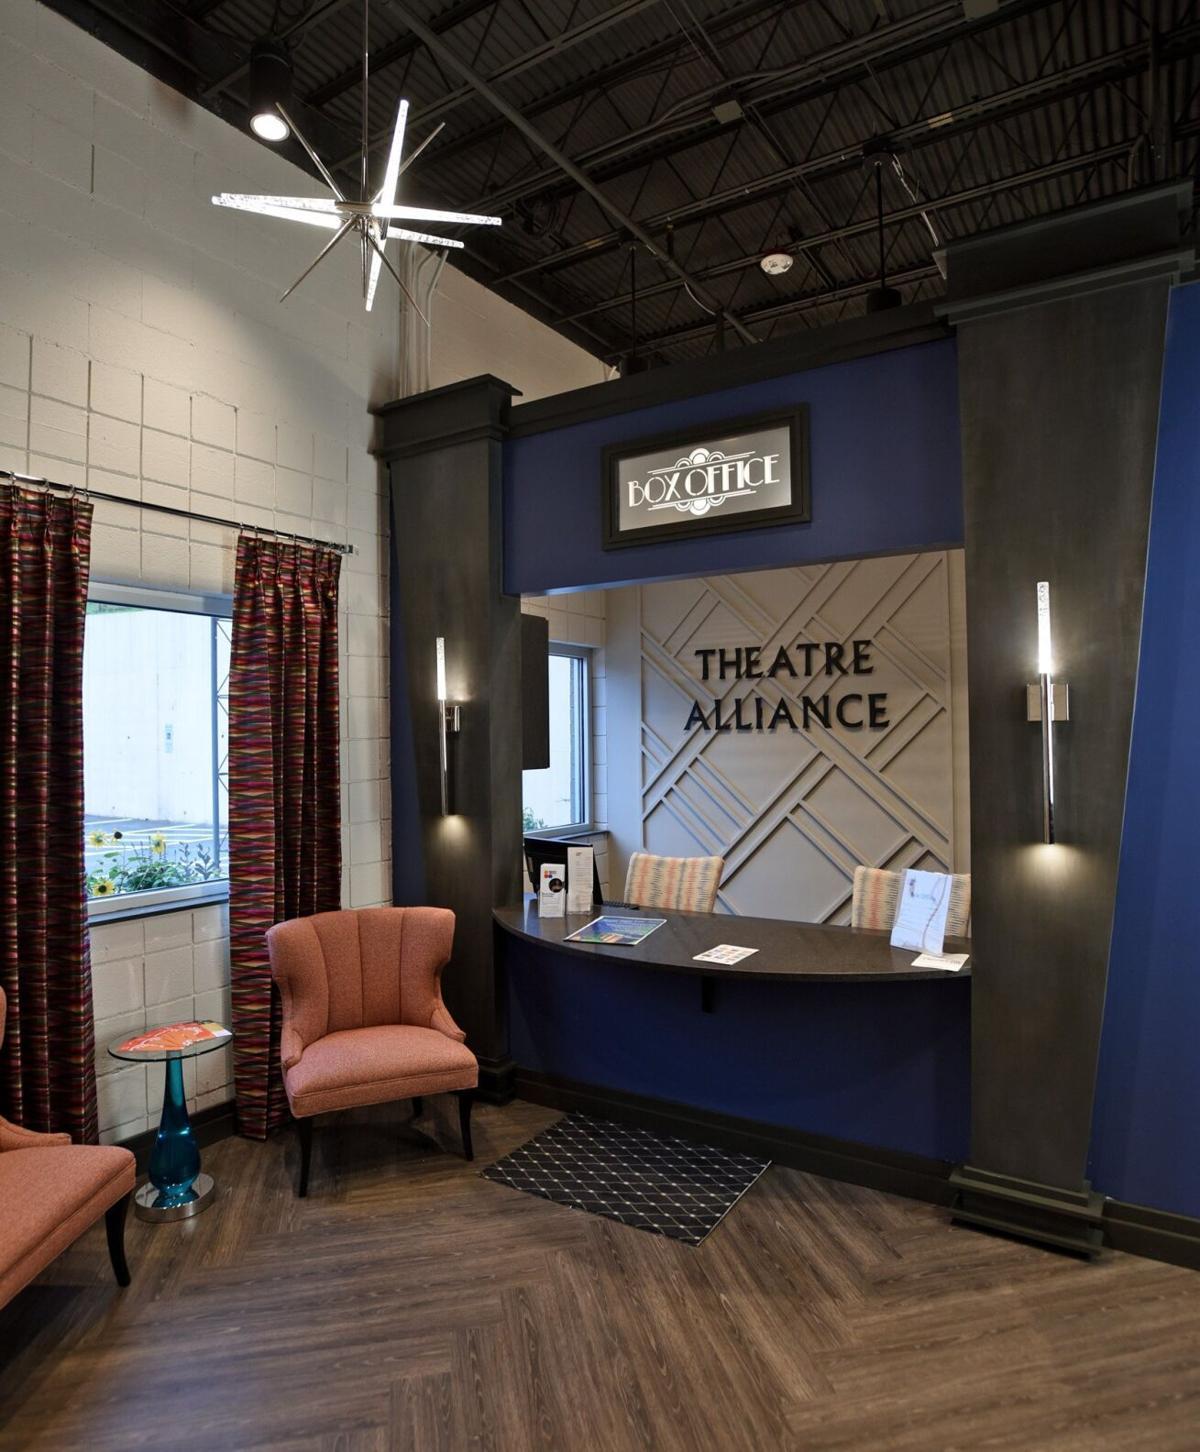 Winston-Salem Theatre Alliance